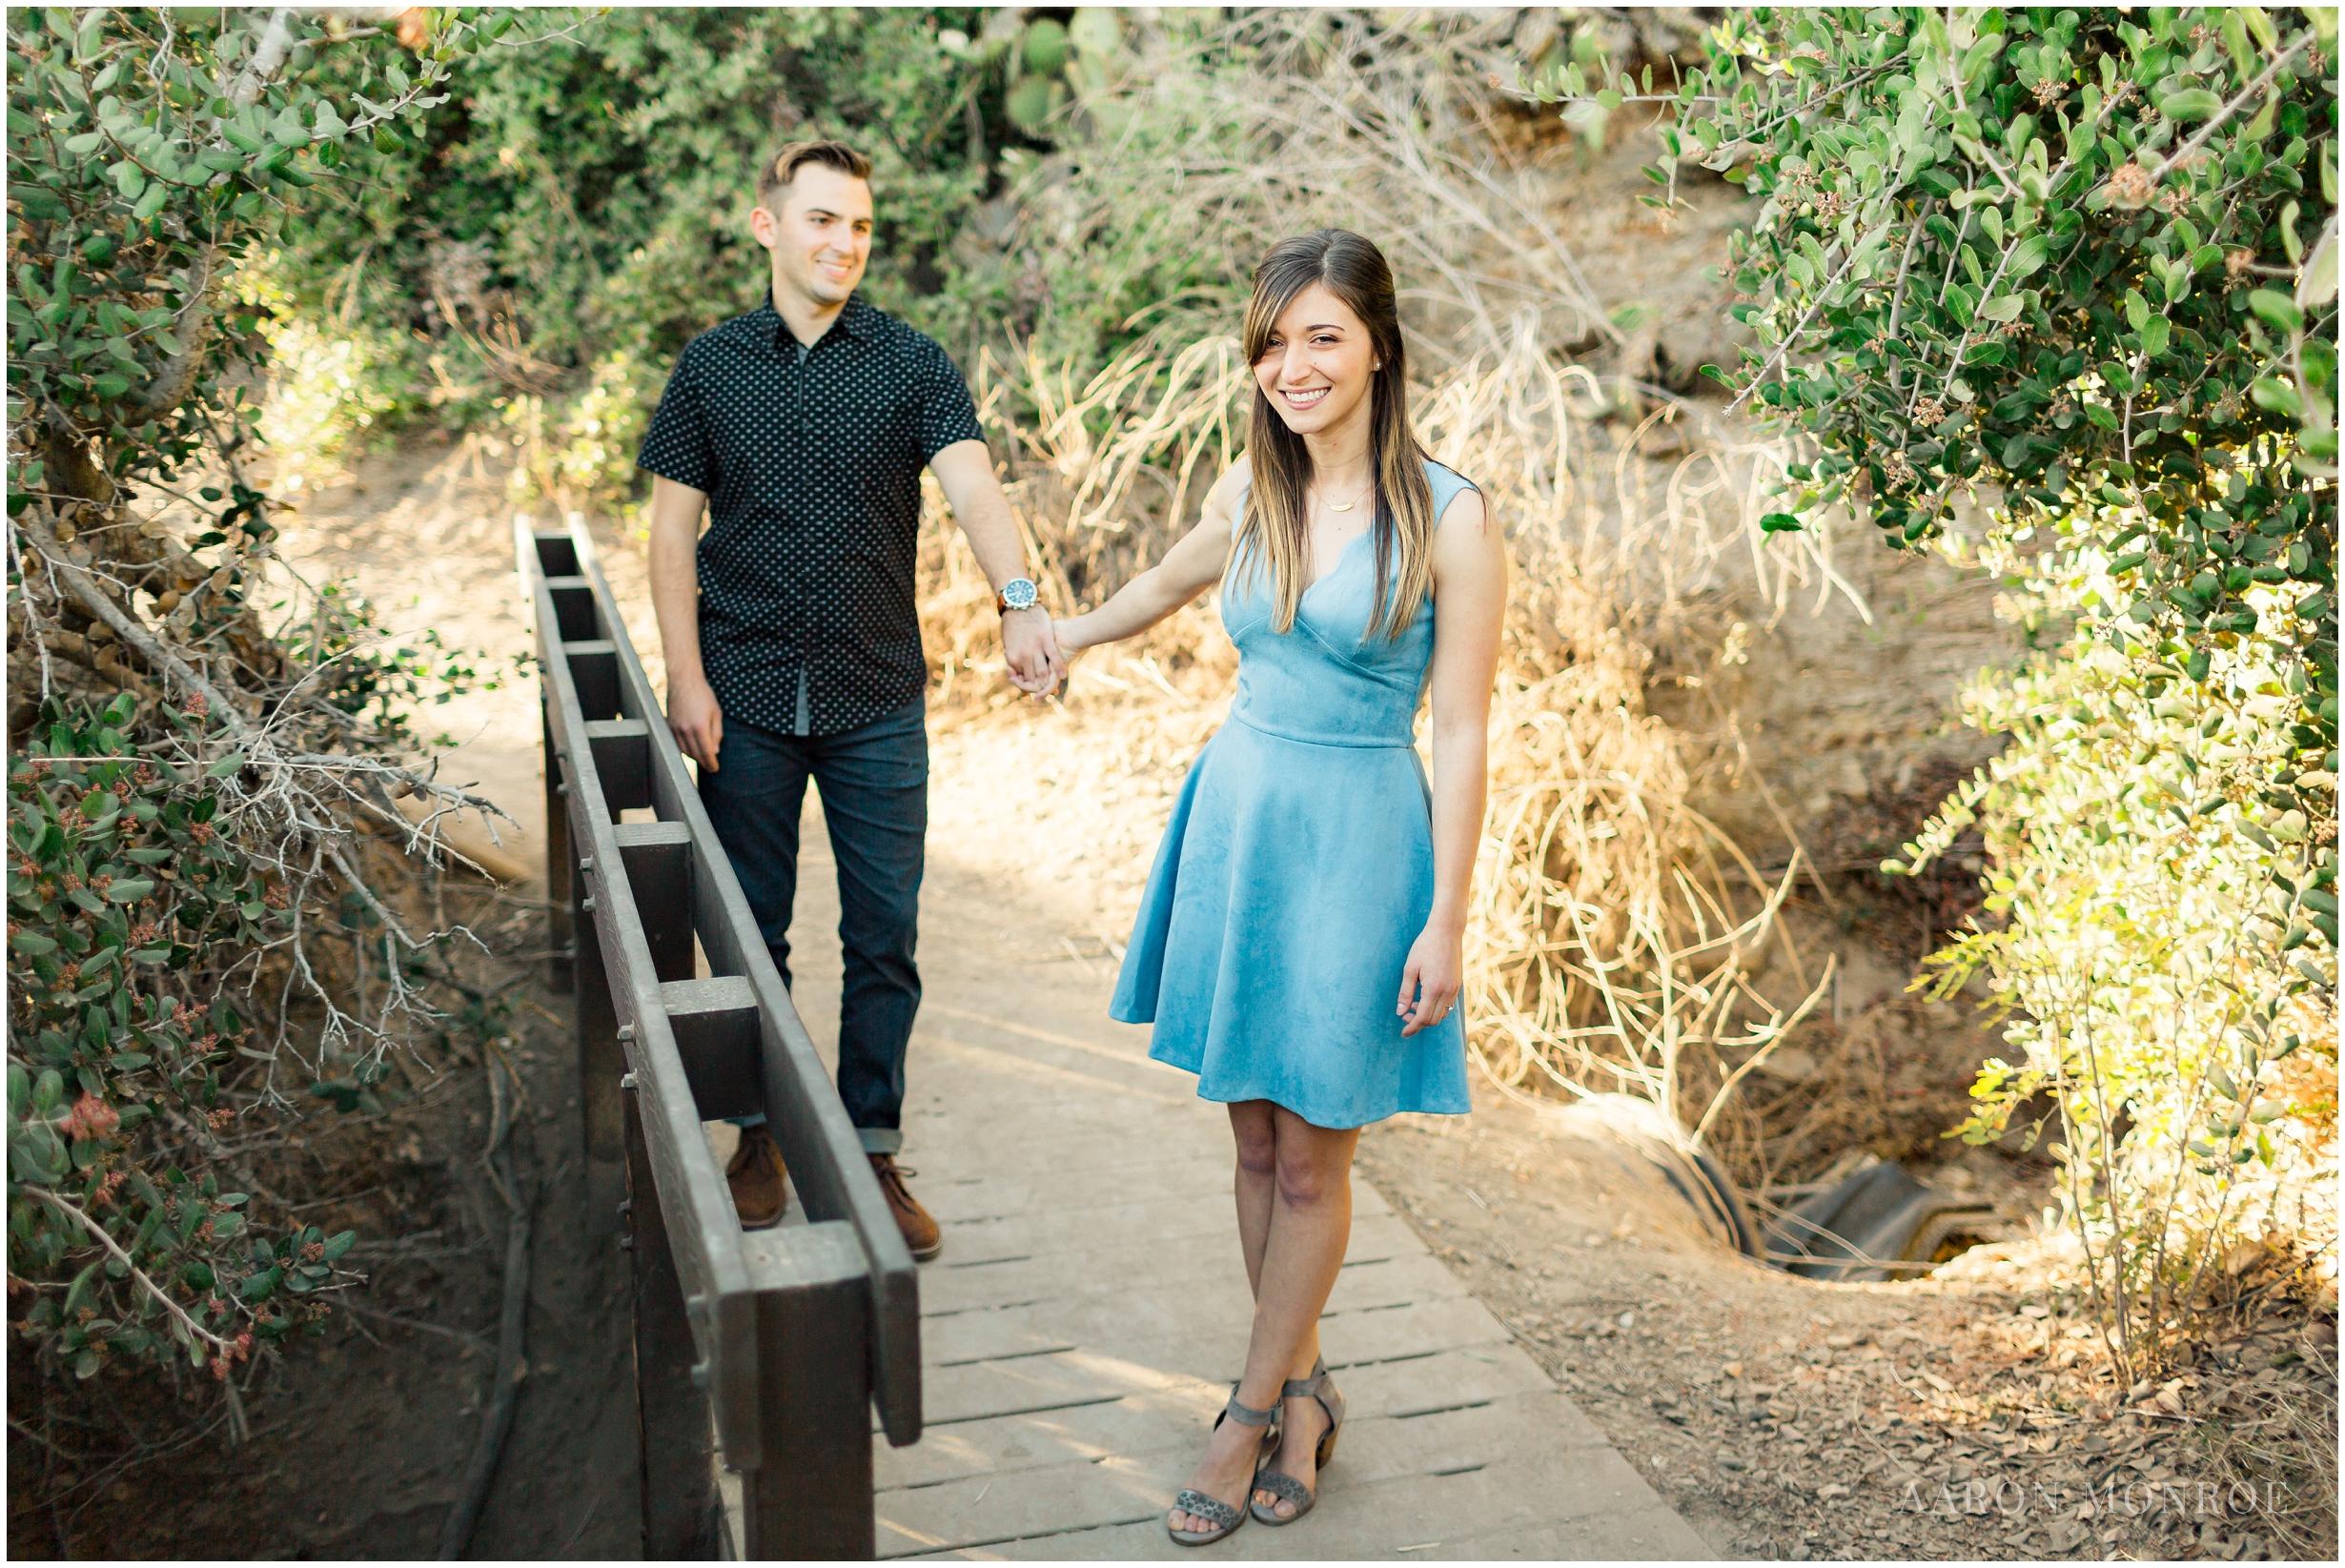 Abalone_Cove_Engagement_Los_Angeles_Wedding_Photographer_0260.jpg